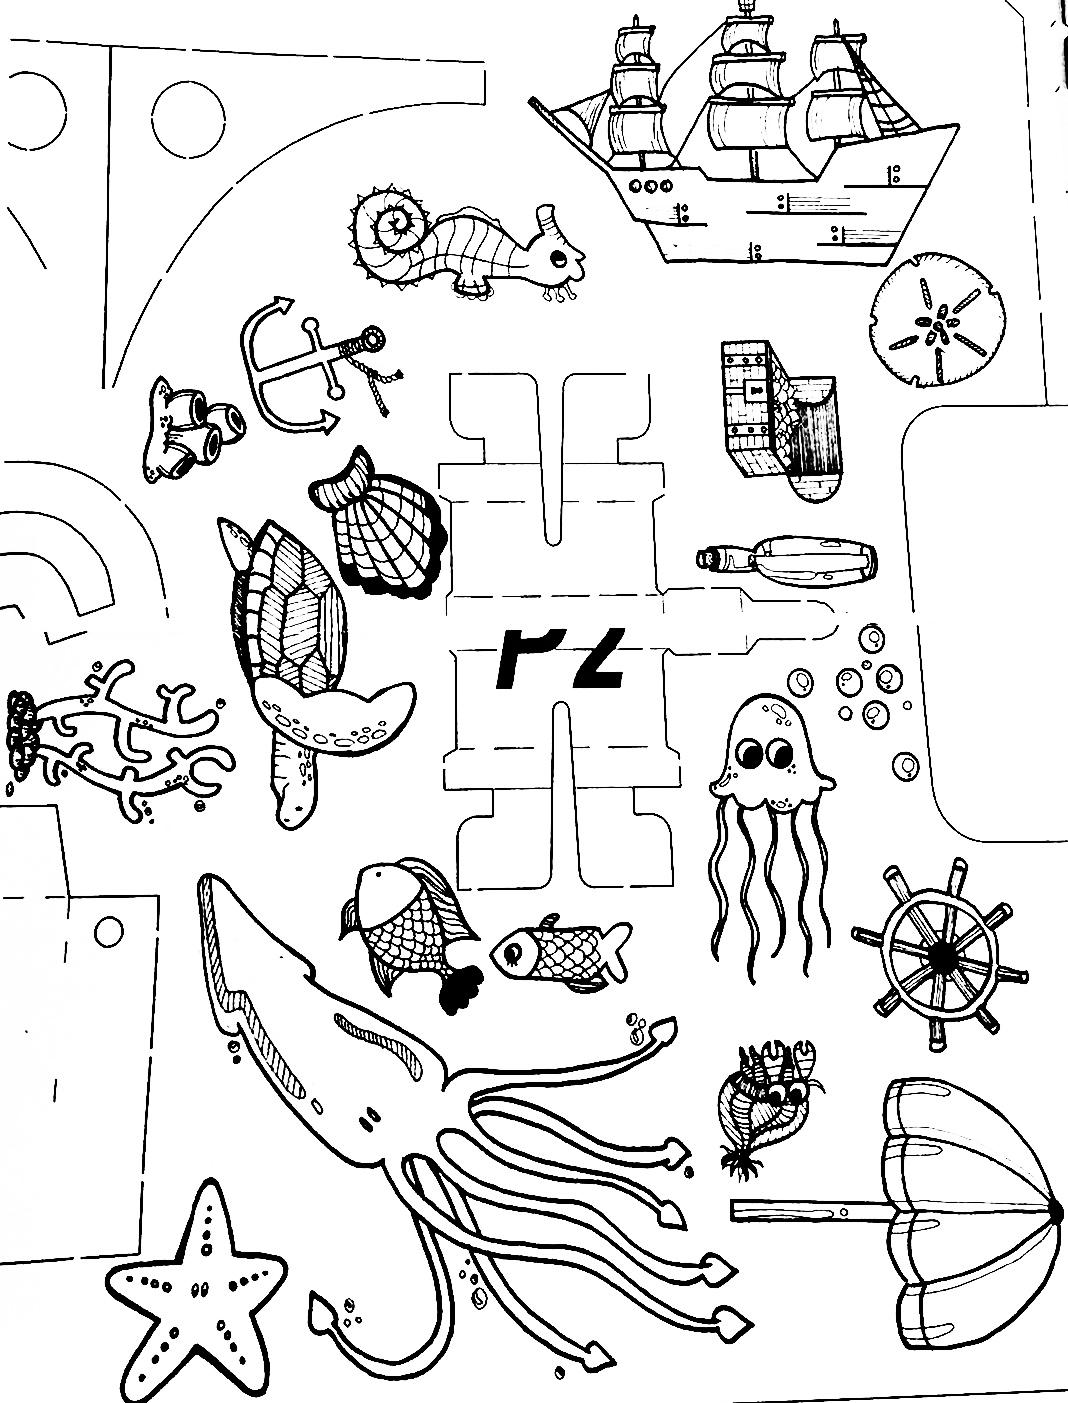 "Terry Peterson   The following is placeholder text known as ""lorem ipsum,"" which is scrambled Latin used by designers to mimic real copy. Quisque congue porttitor ullamcorper. Vivamus a ante congue, porta nunc nec, hendrerit turpis. Maecenas non leo laoreet, condimentum lorem nec, vulputate massa."